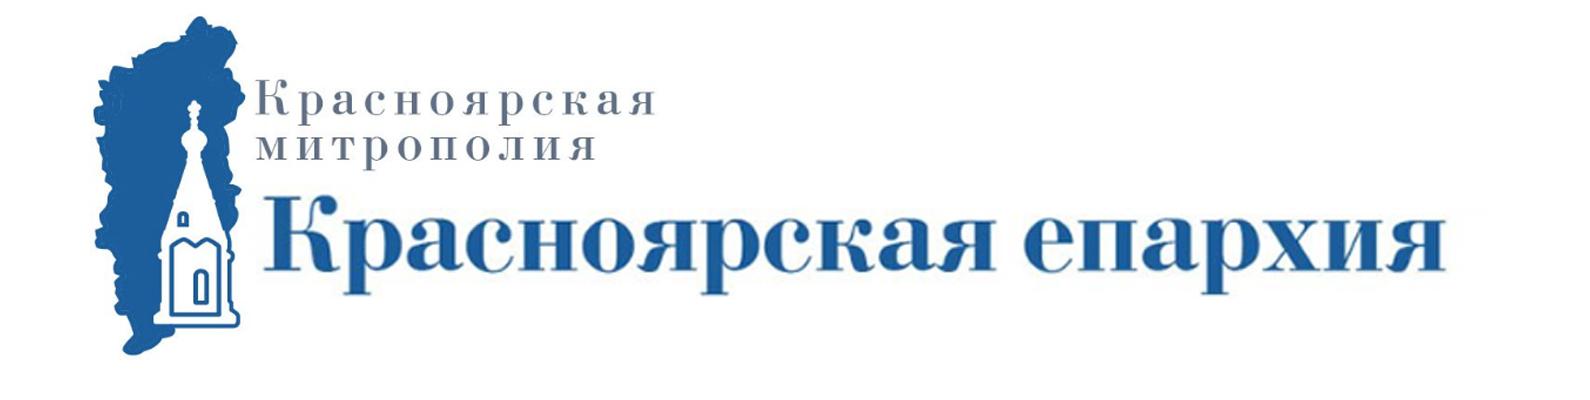 krasnoyrsk.jpg